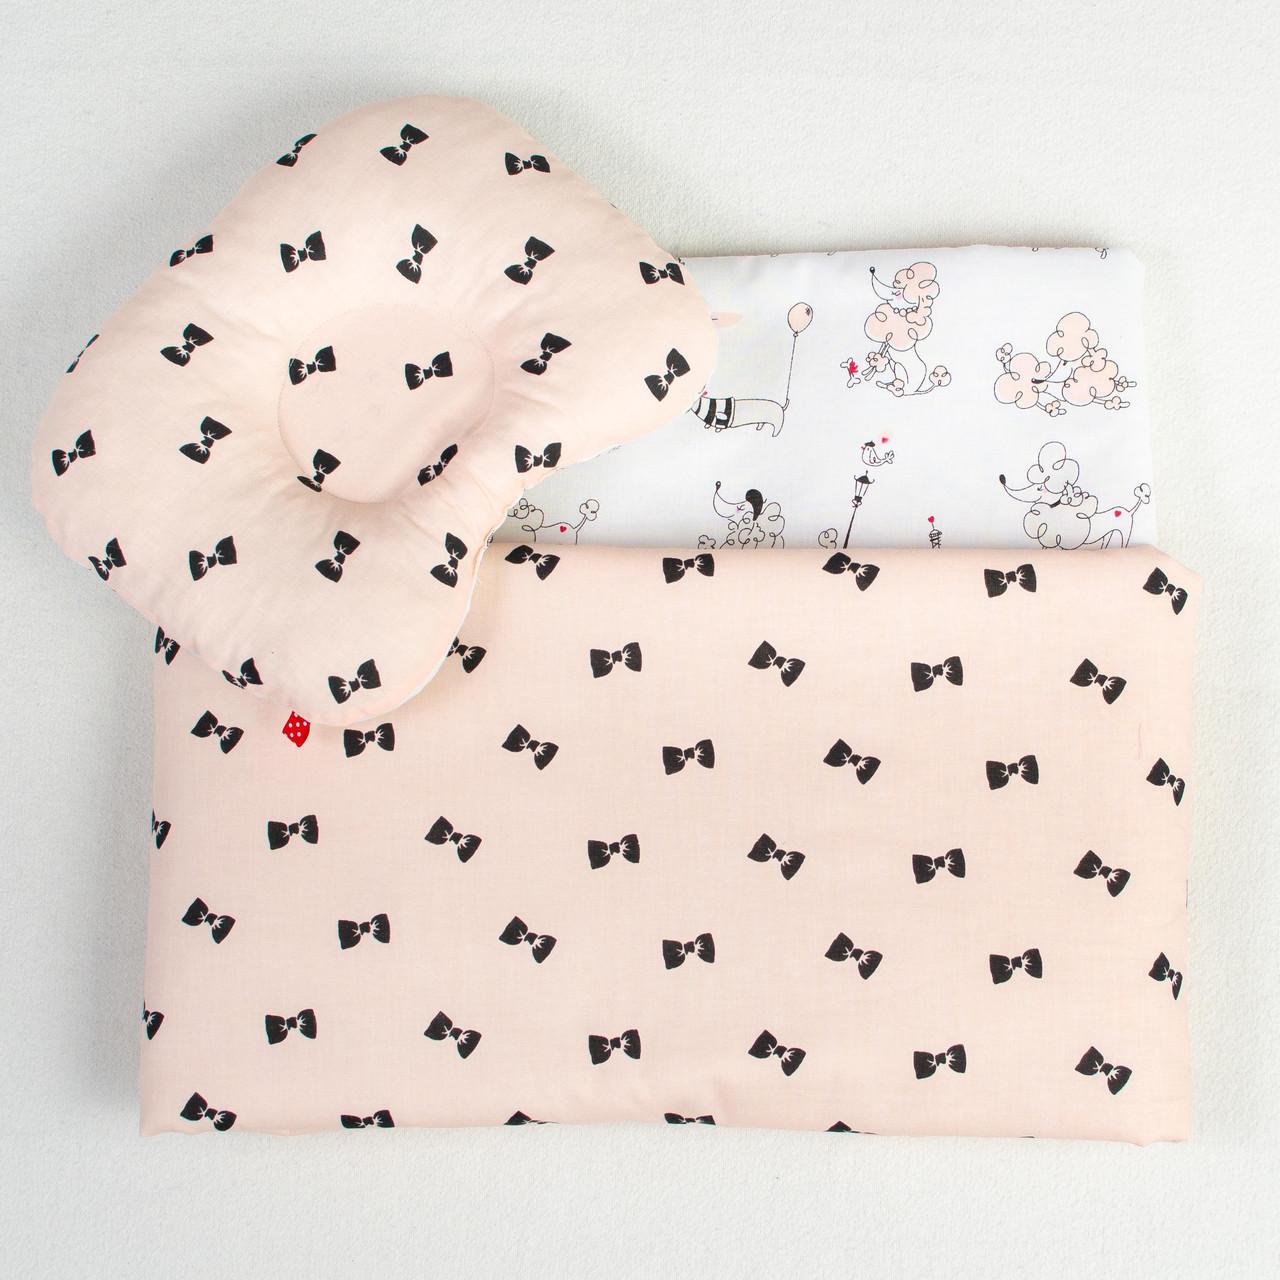 Одеяло 65 х 75 см и  подушка 22 х 26 см  для новорожденных  Бантики